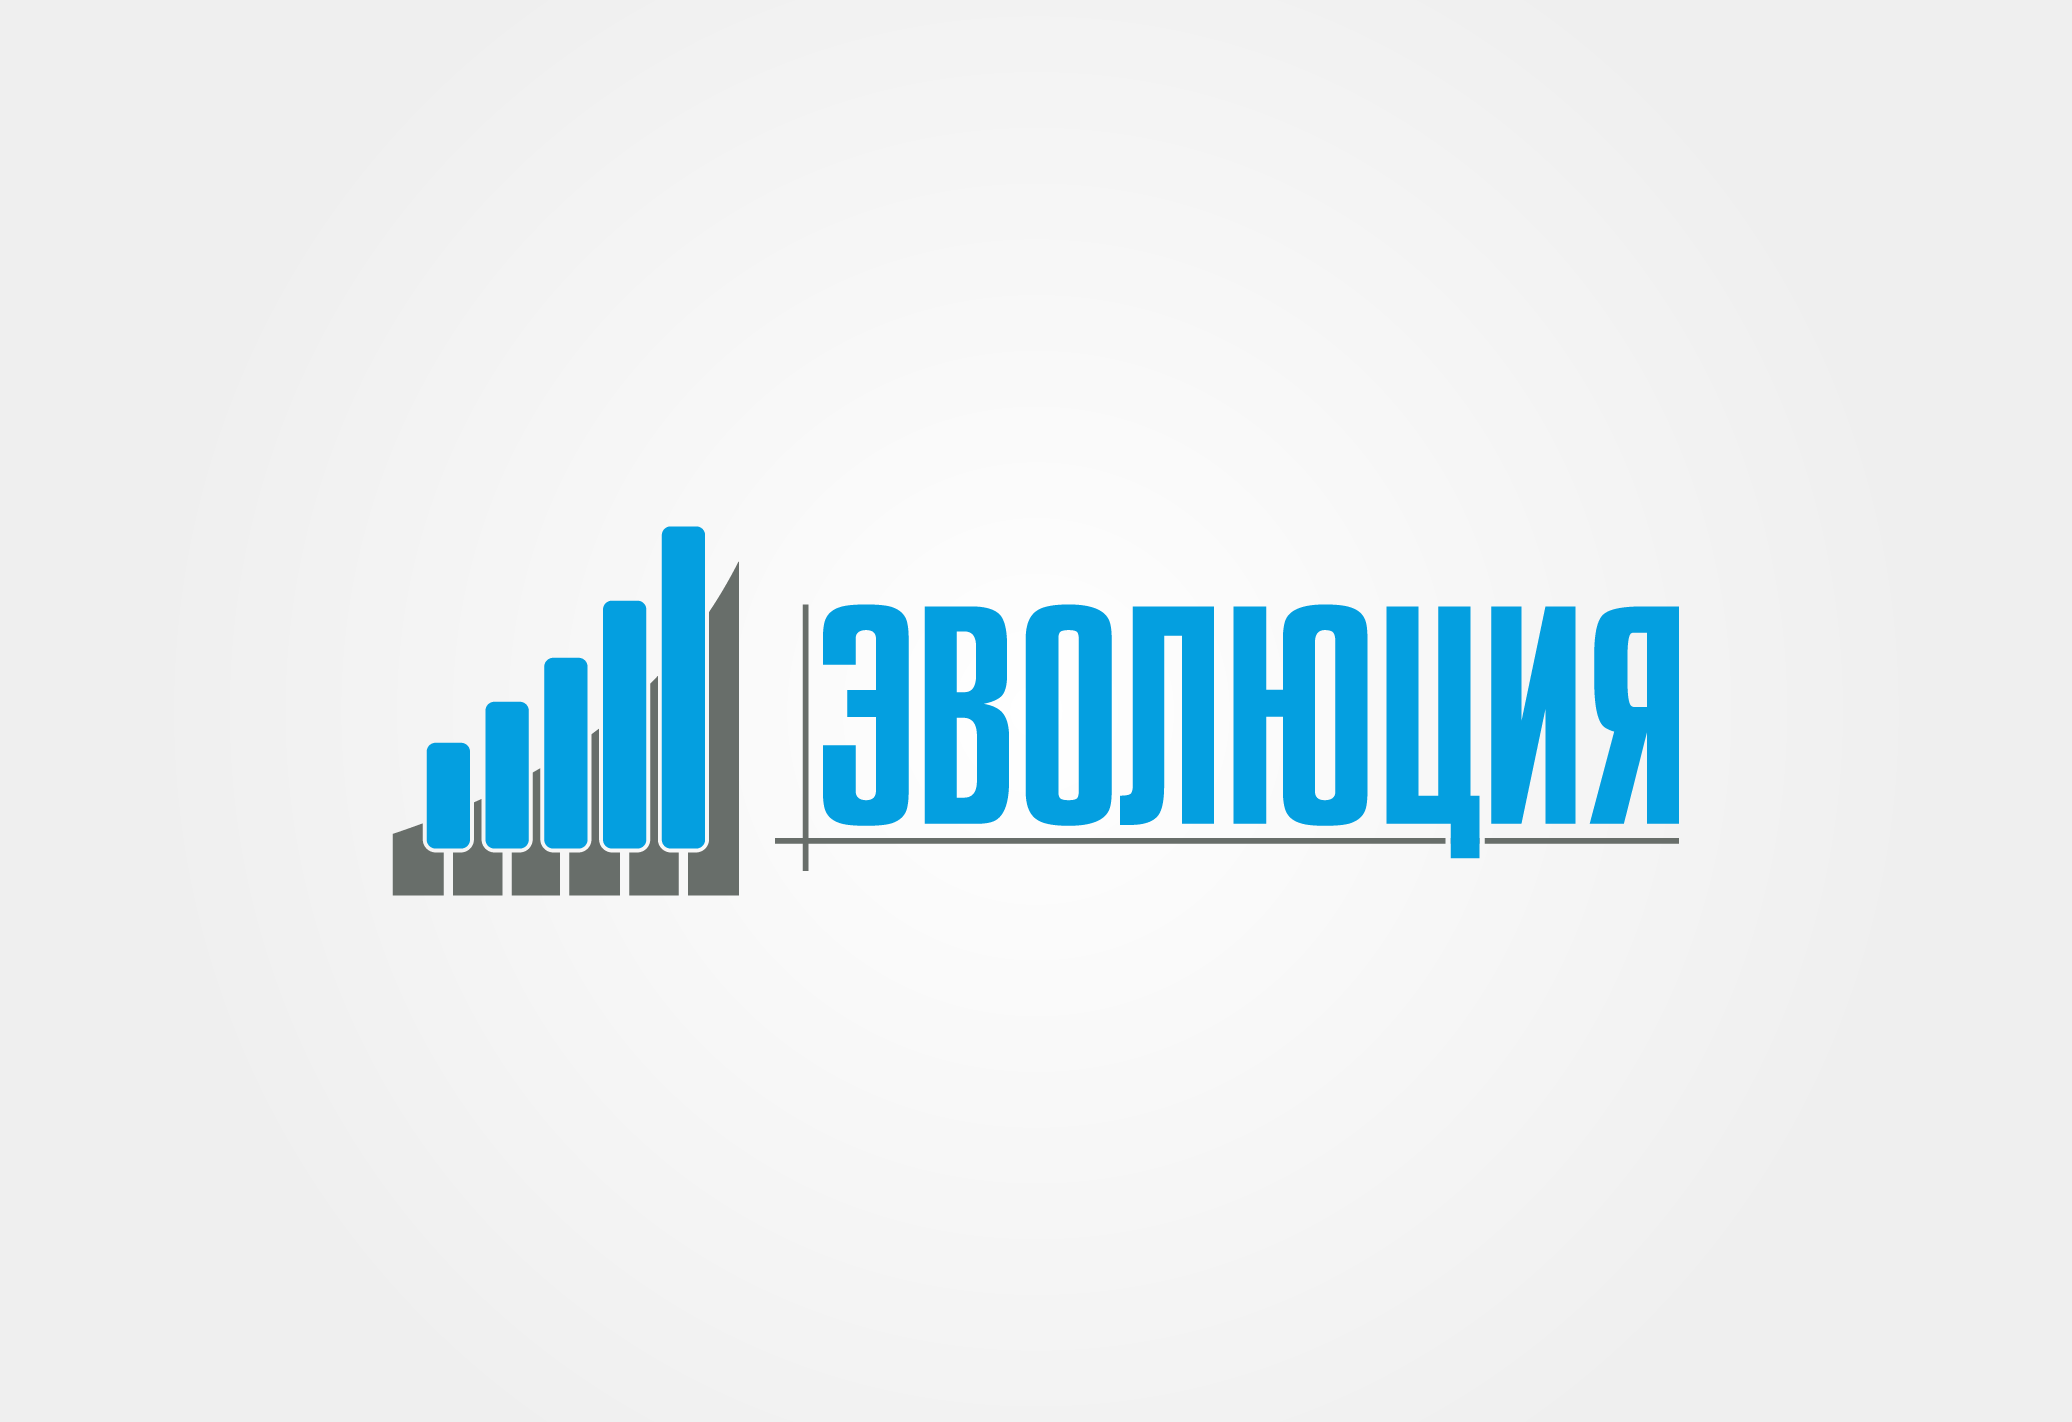 Разработать логотип для Онлайн-школы и сообщества фото f_3915bc8517f9b8d2.png